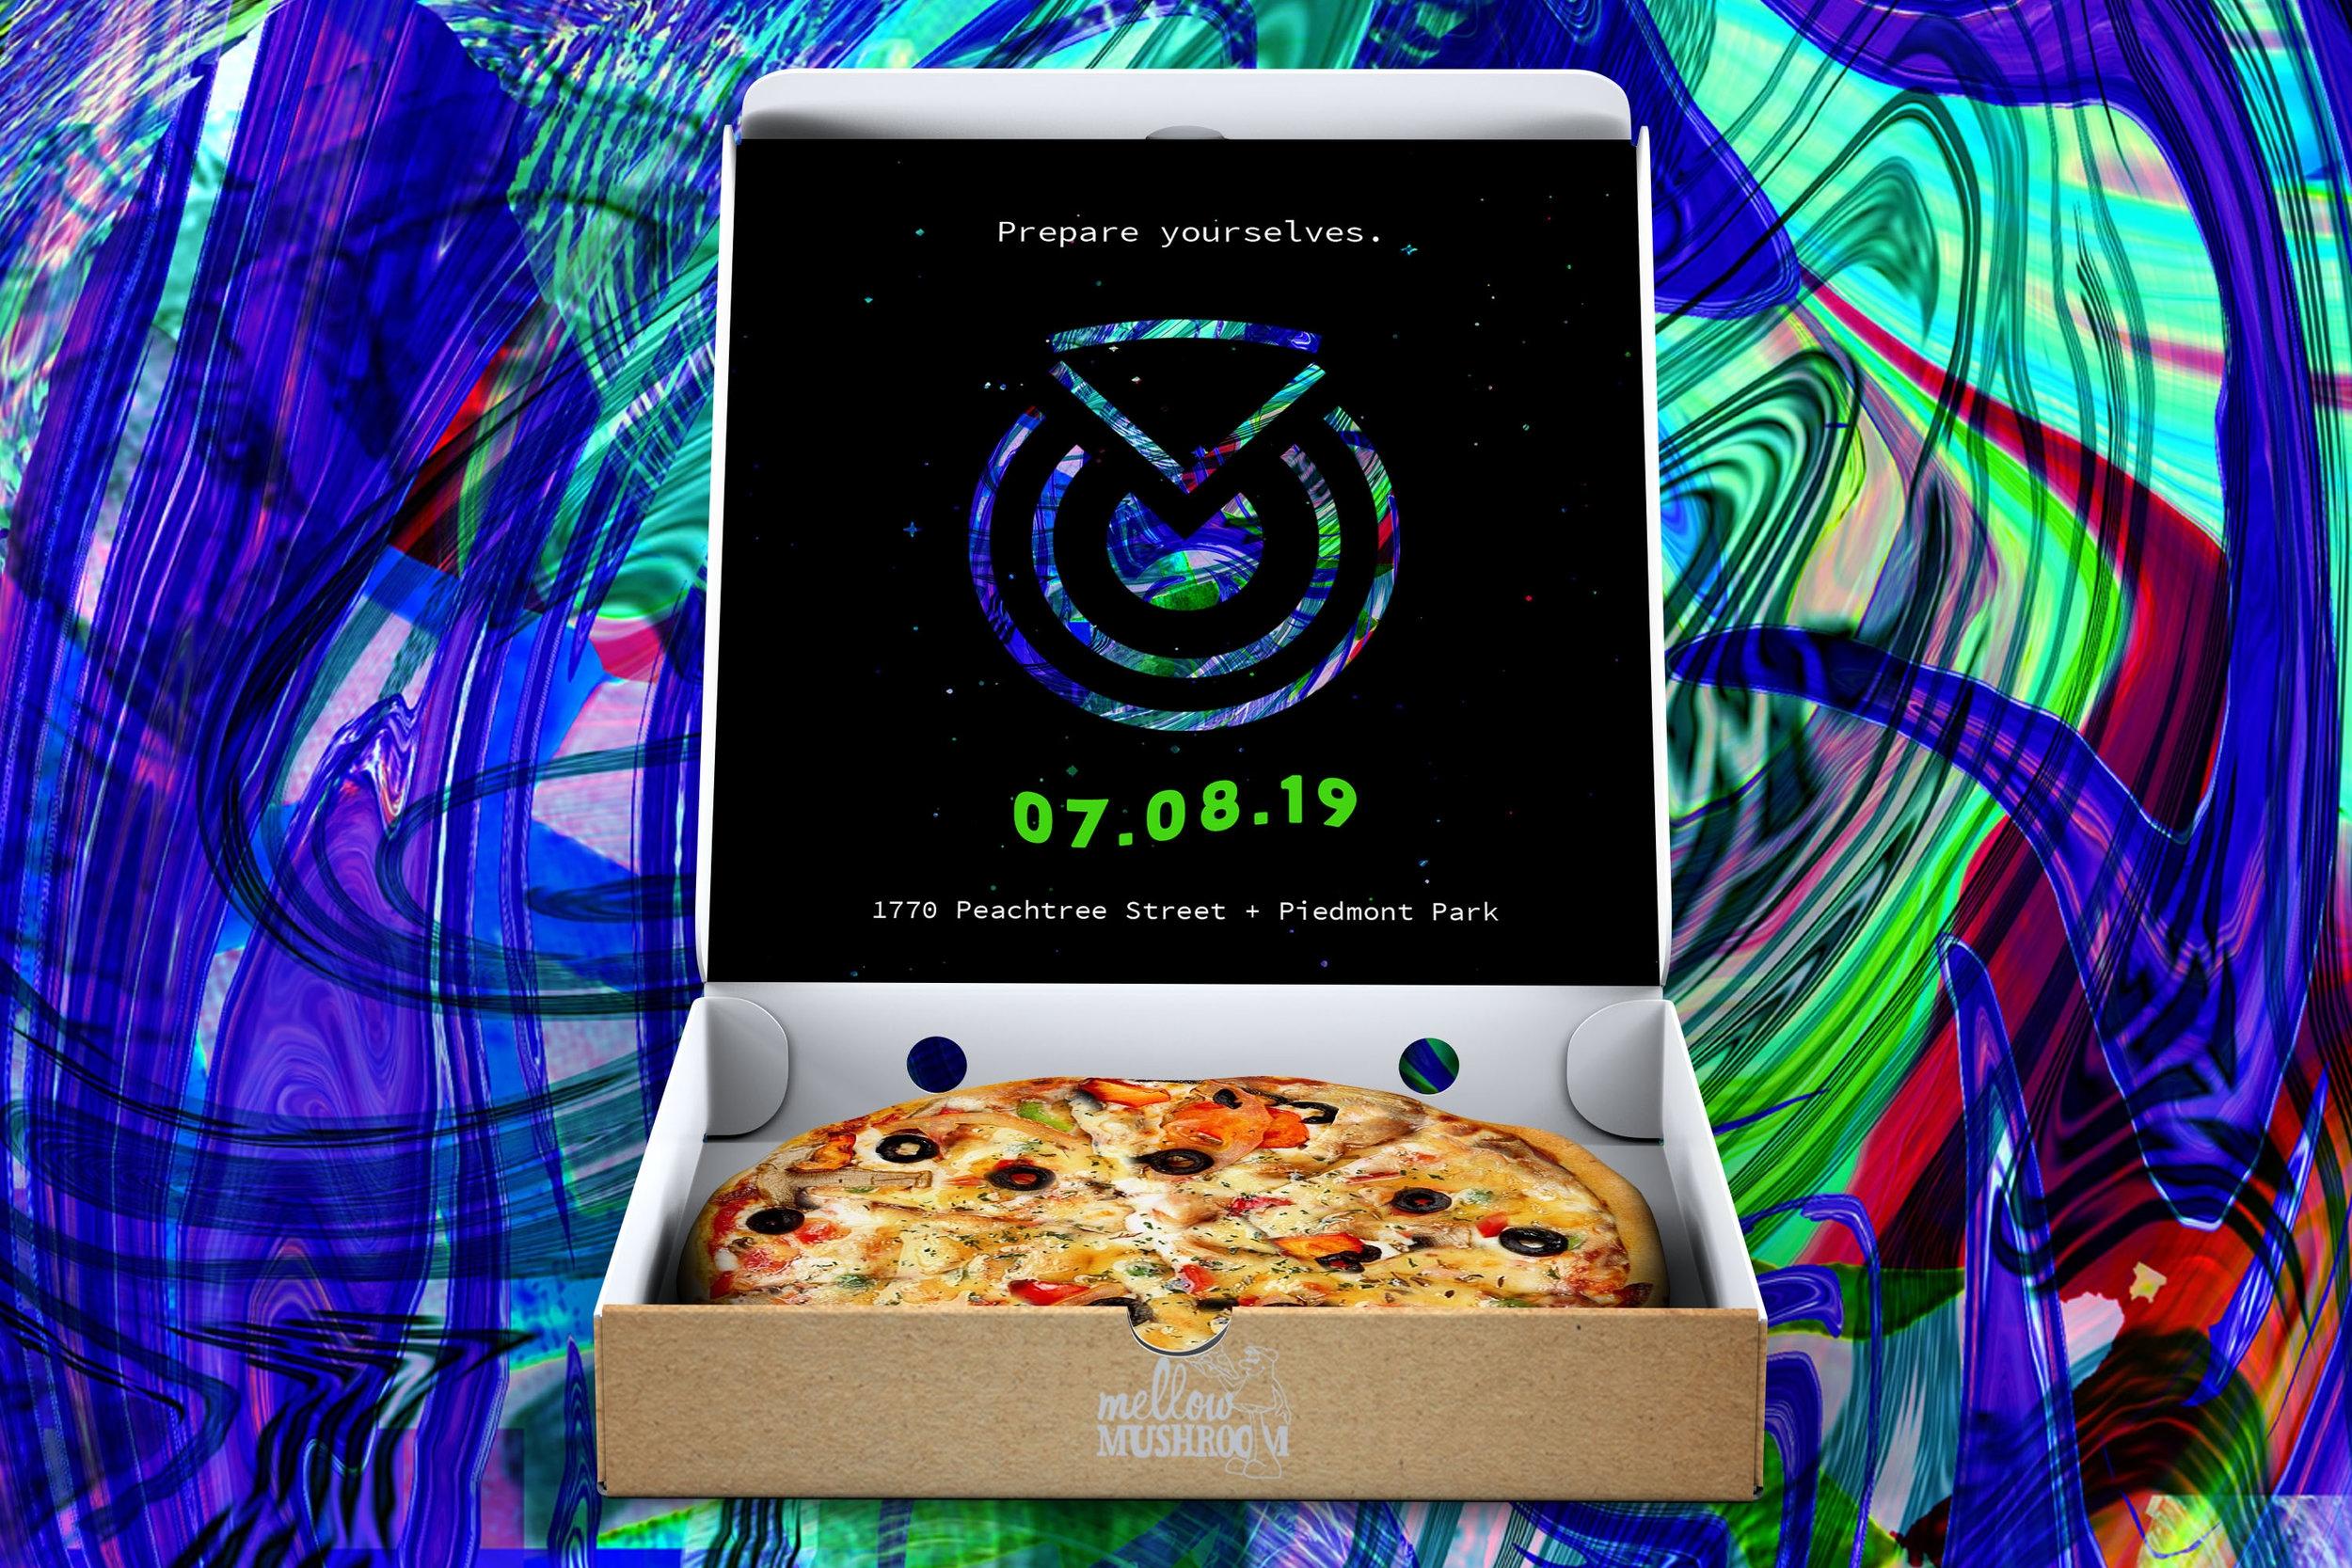 mellow pizza box 3.jpg